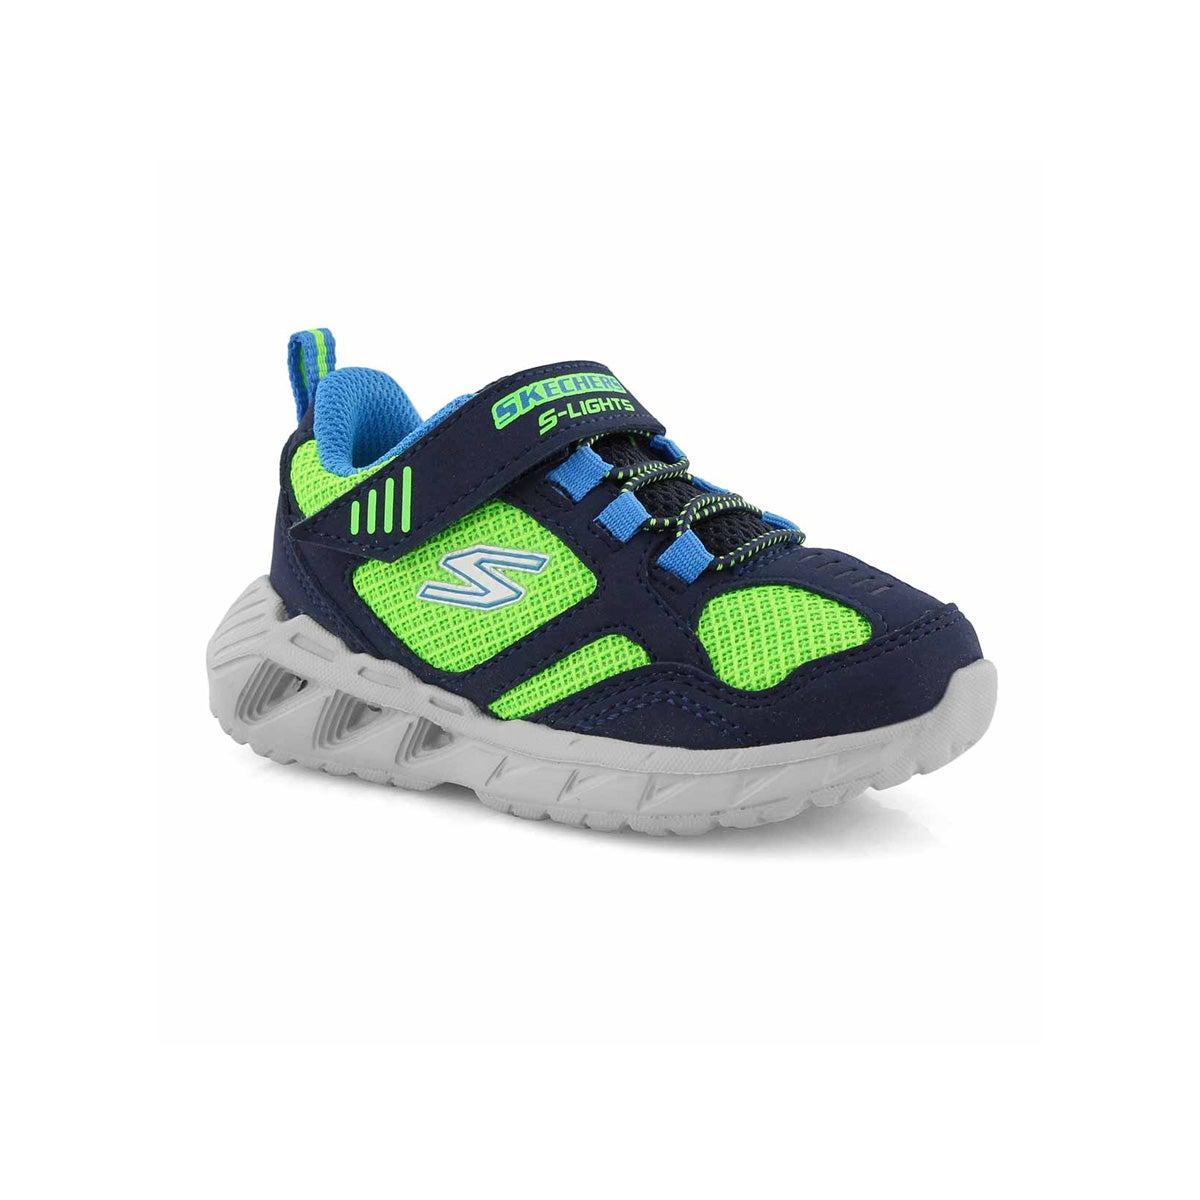 skechers green shoes